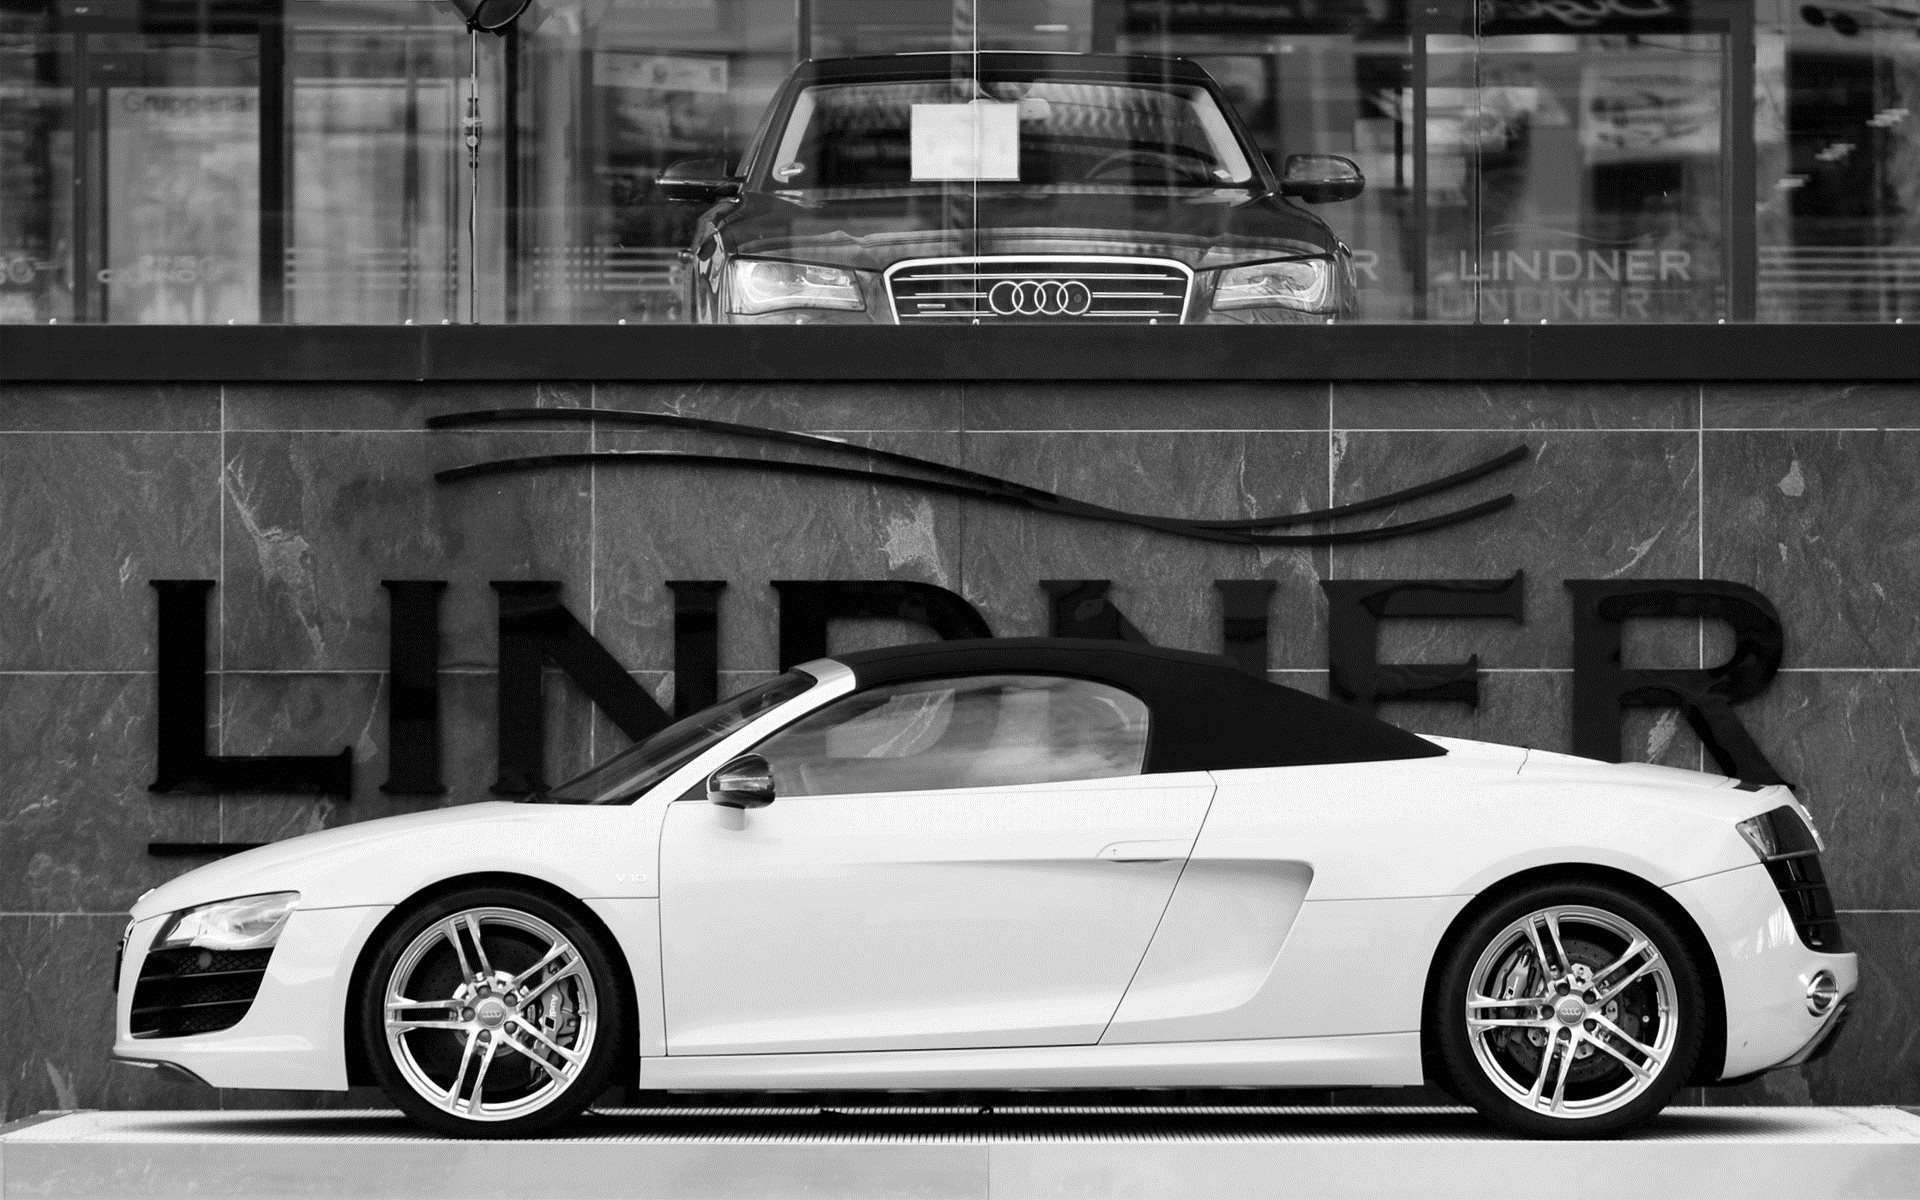 Wallpaper Monochrome Sports Car Audi R8 Coupe Audi R8 Spyder